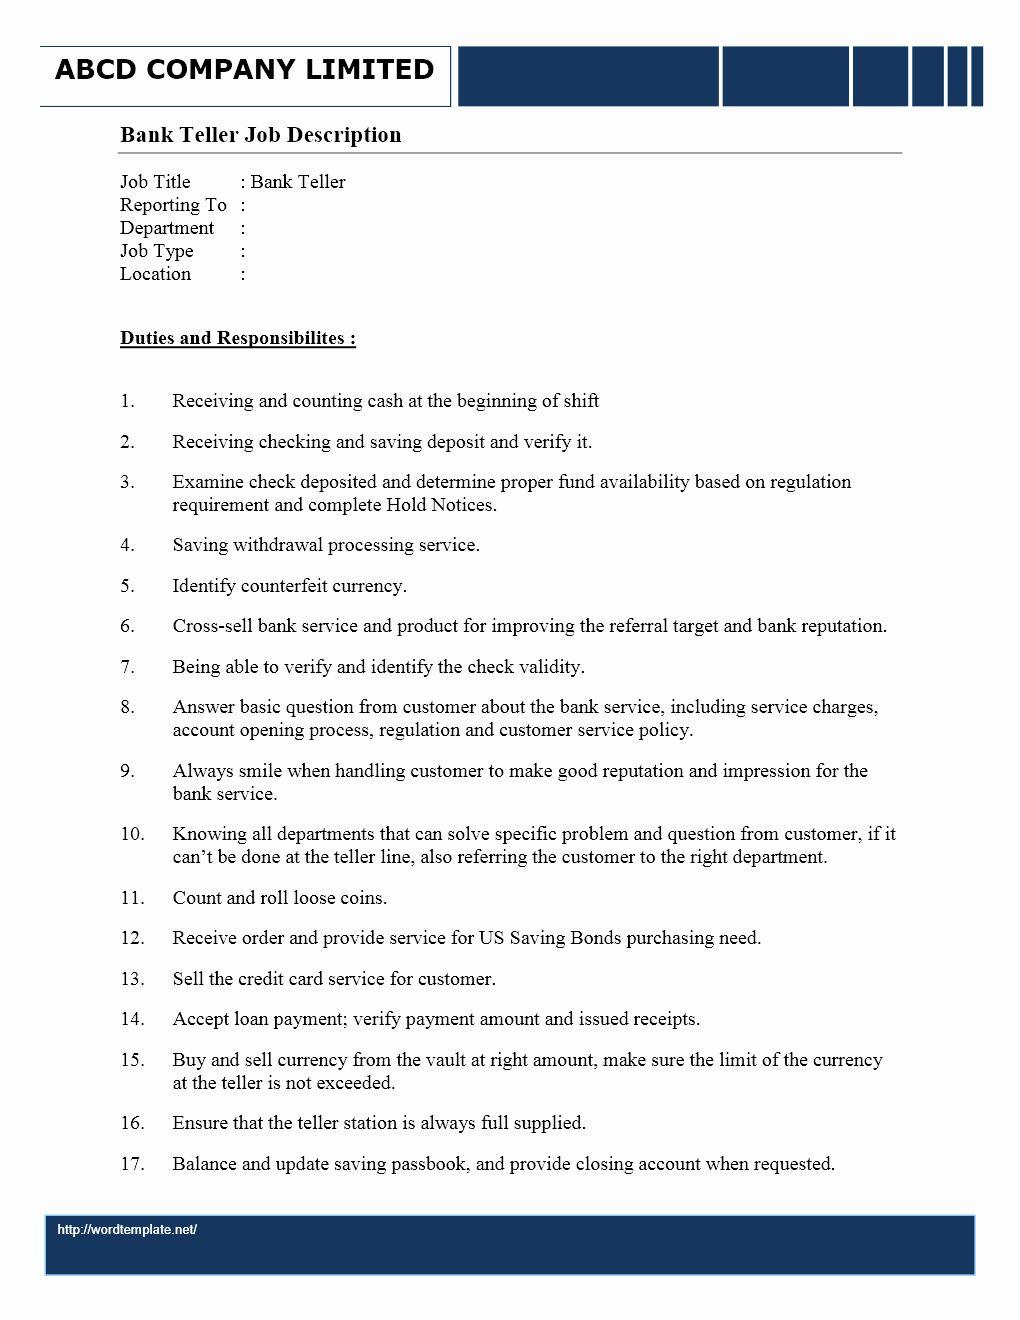 Bank Teller Job Description Resume Luxury Bank Teller Job